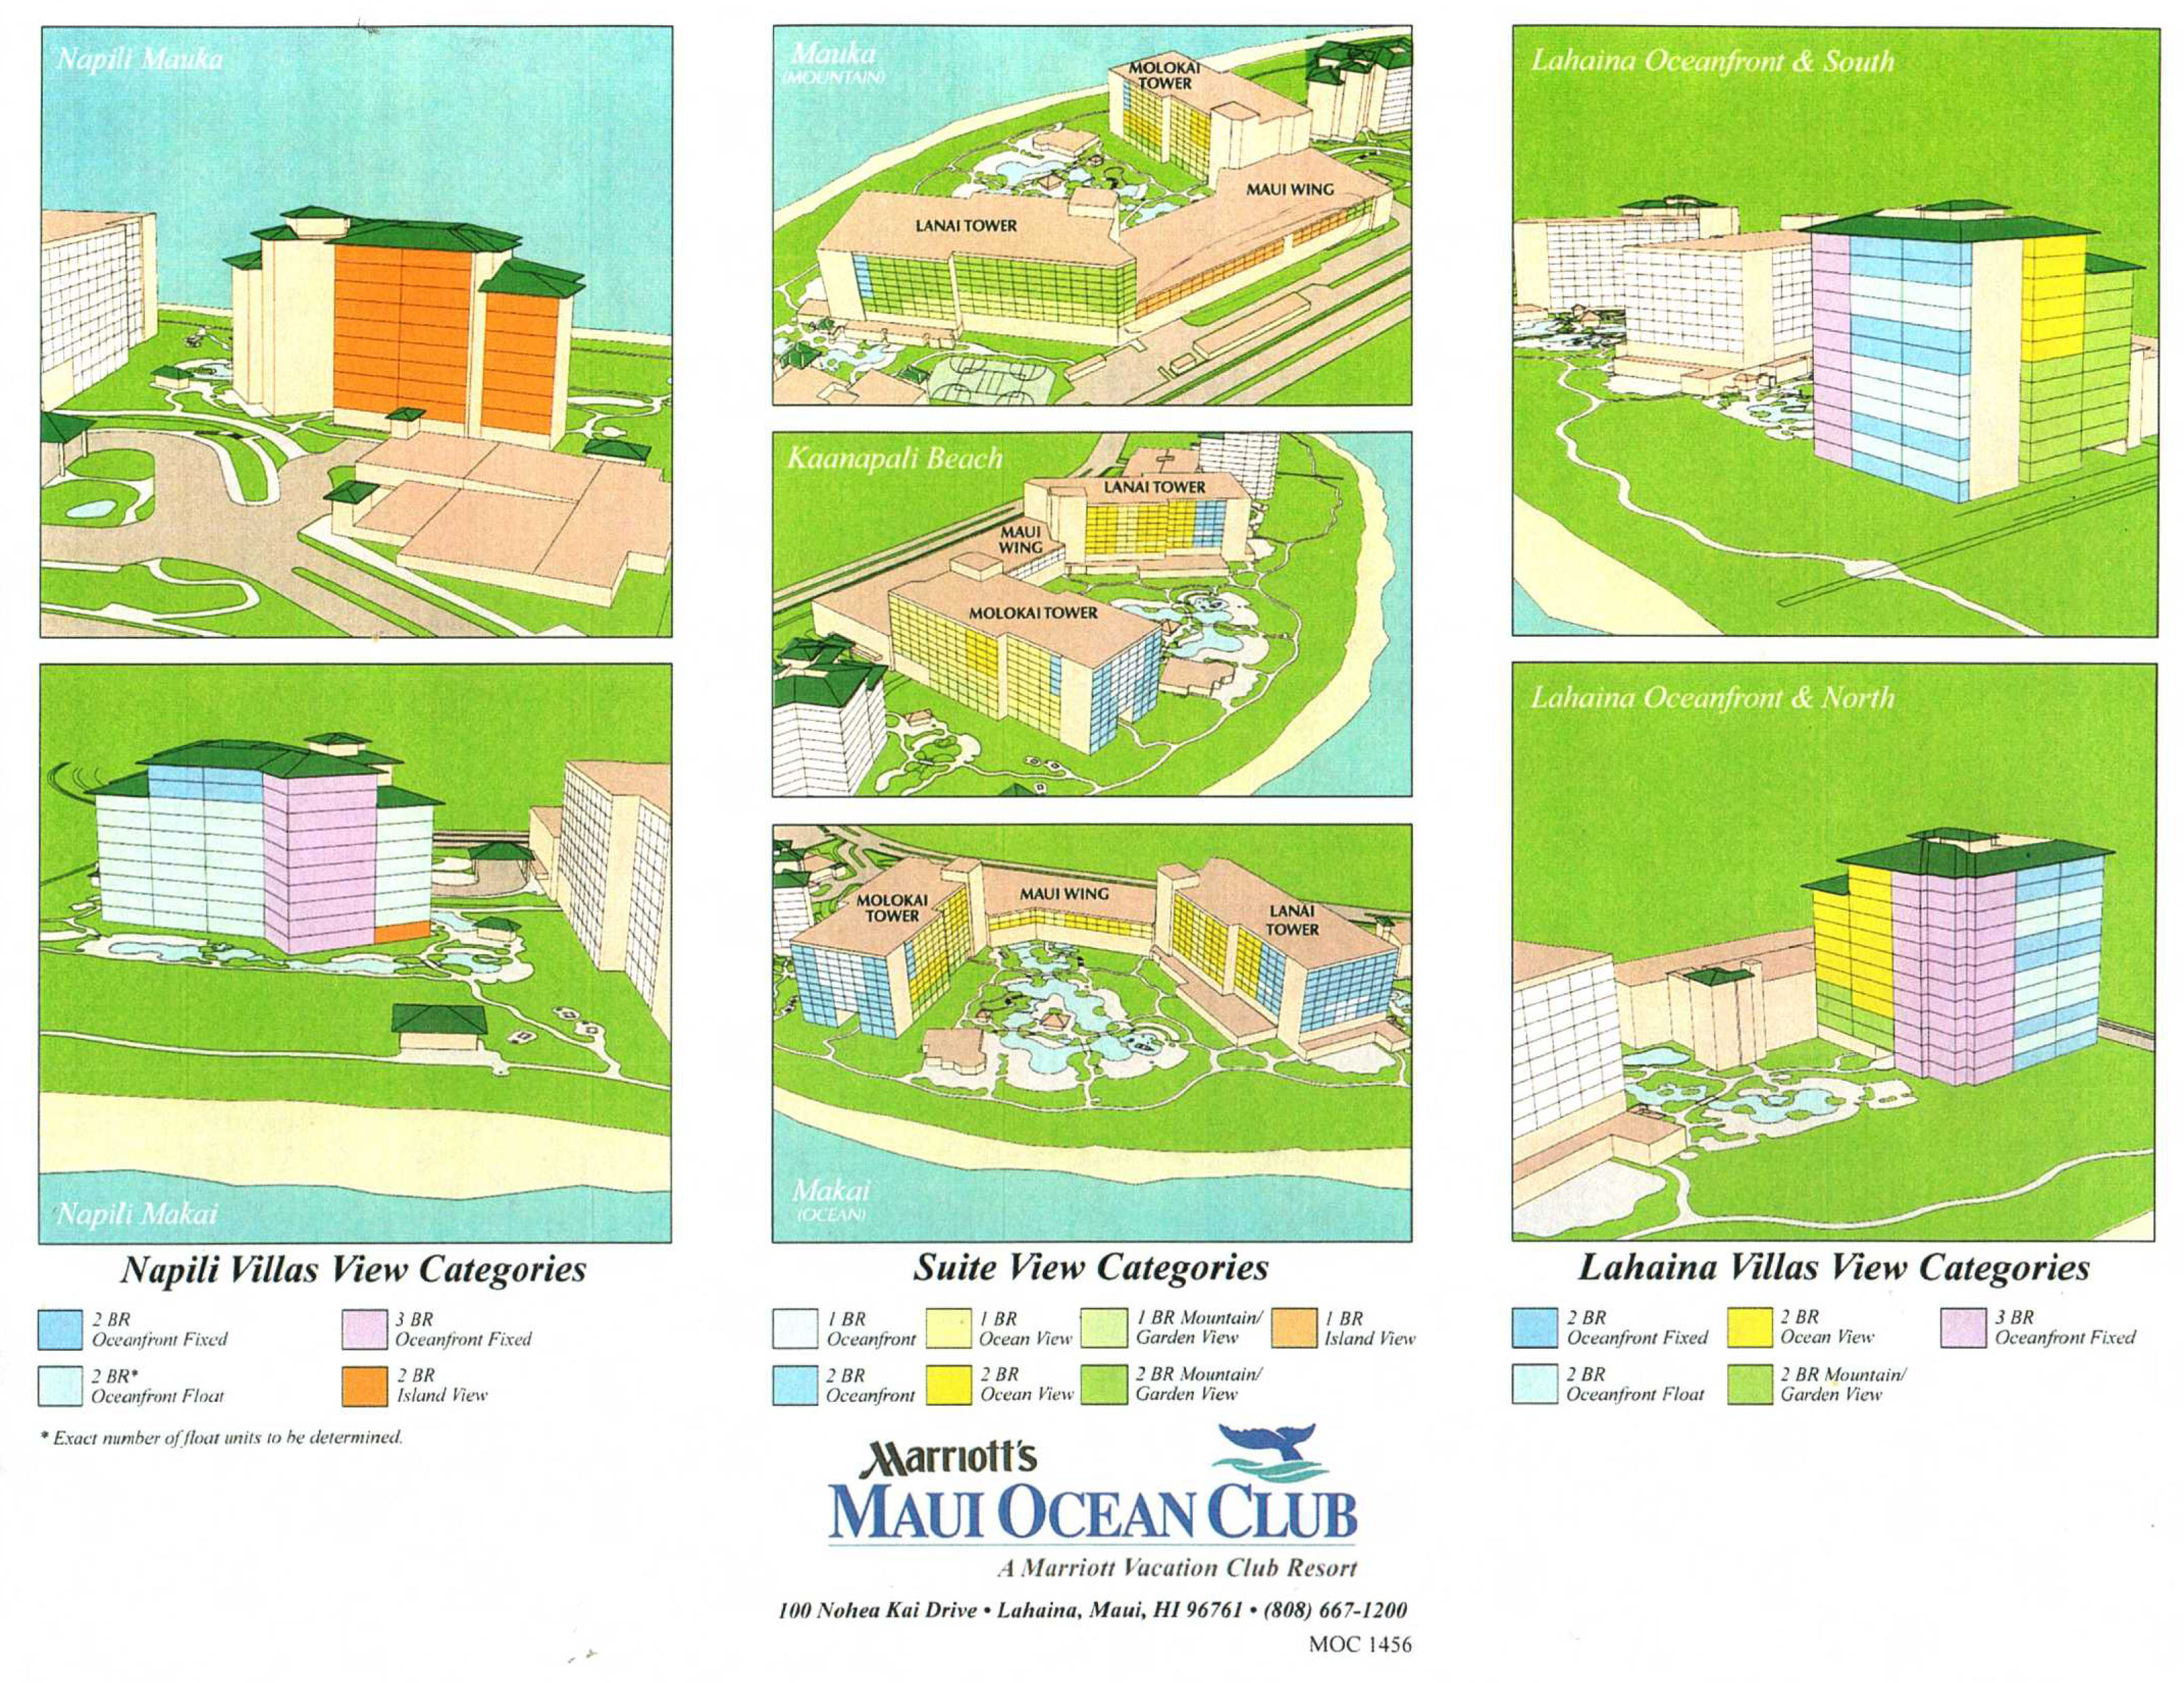 Marriott Maui Ocean Club View Categories